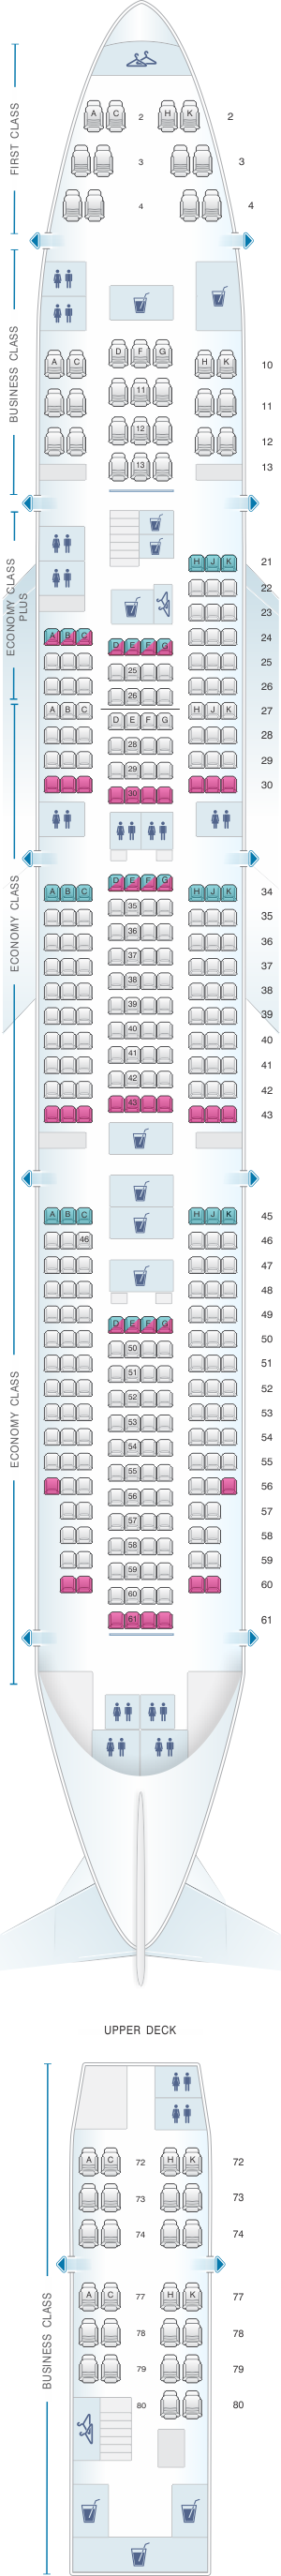 Seat map for El Al Israel Airlines Boeing B747 400 381pax